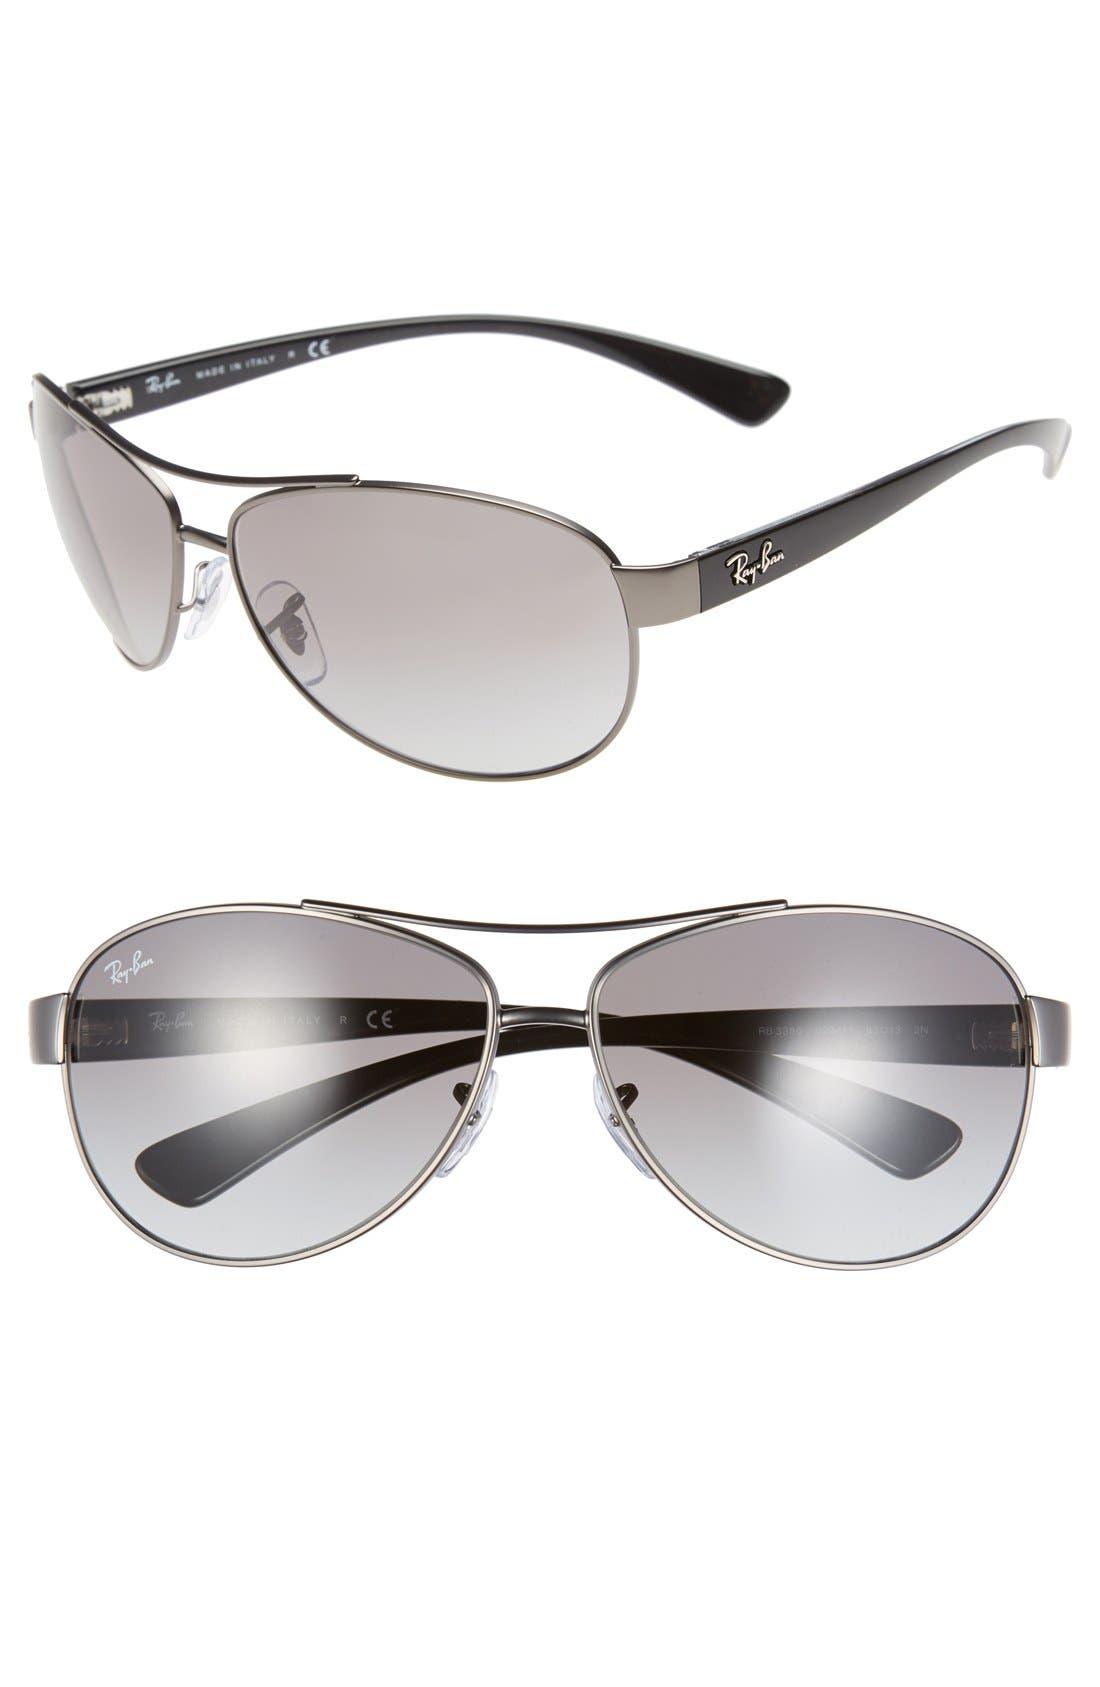 Alternate Image 1 Selected - Ray-Ban 'Bubble Wrap' 63mm Aviator Sunglasses